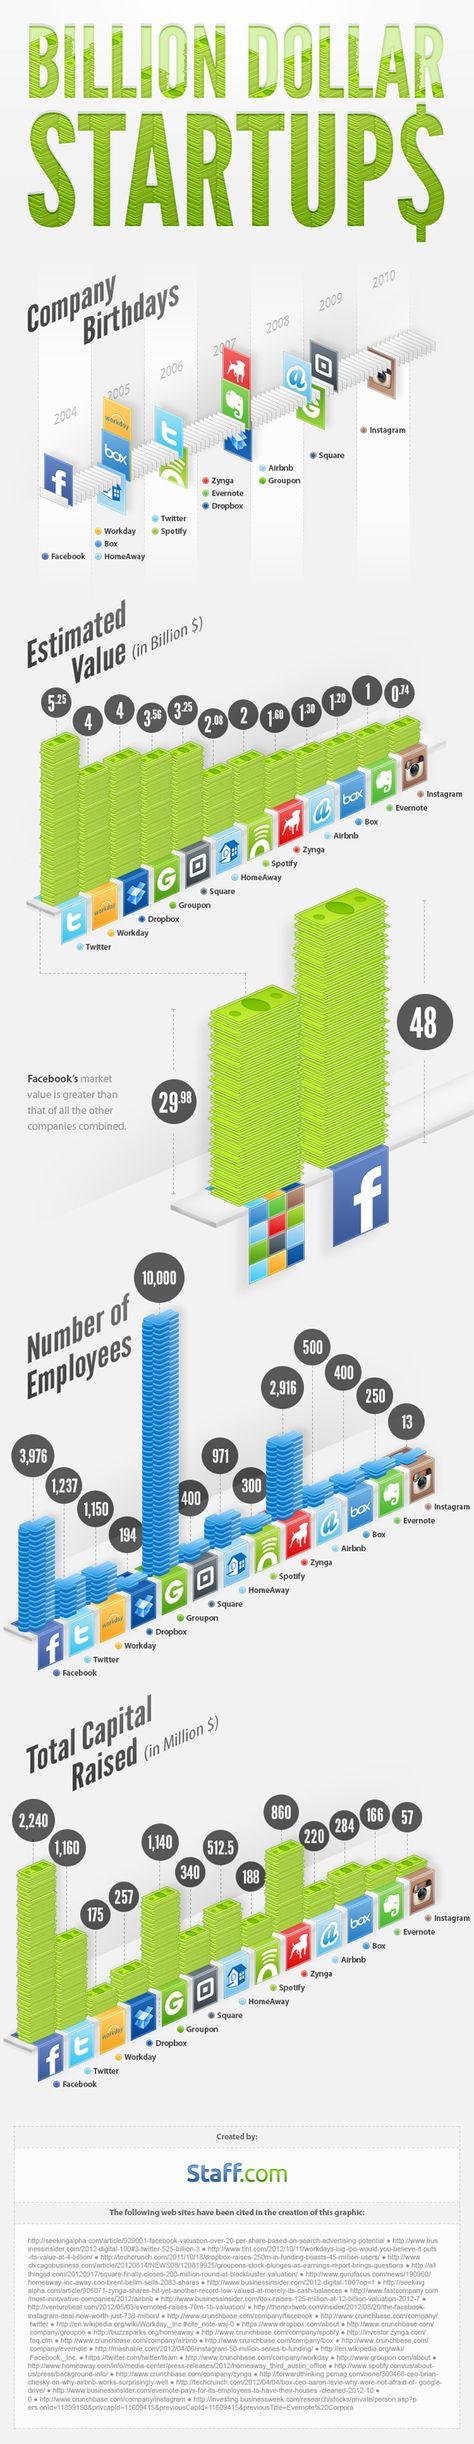 The Billion-Dollar Startups [Infographic]